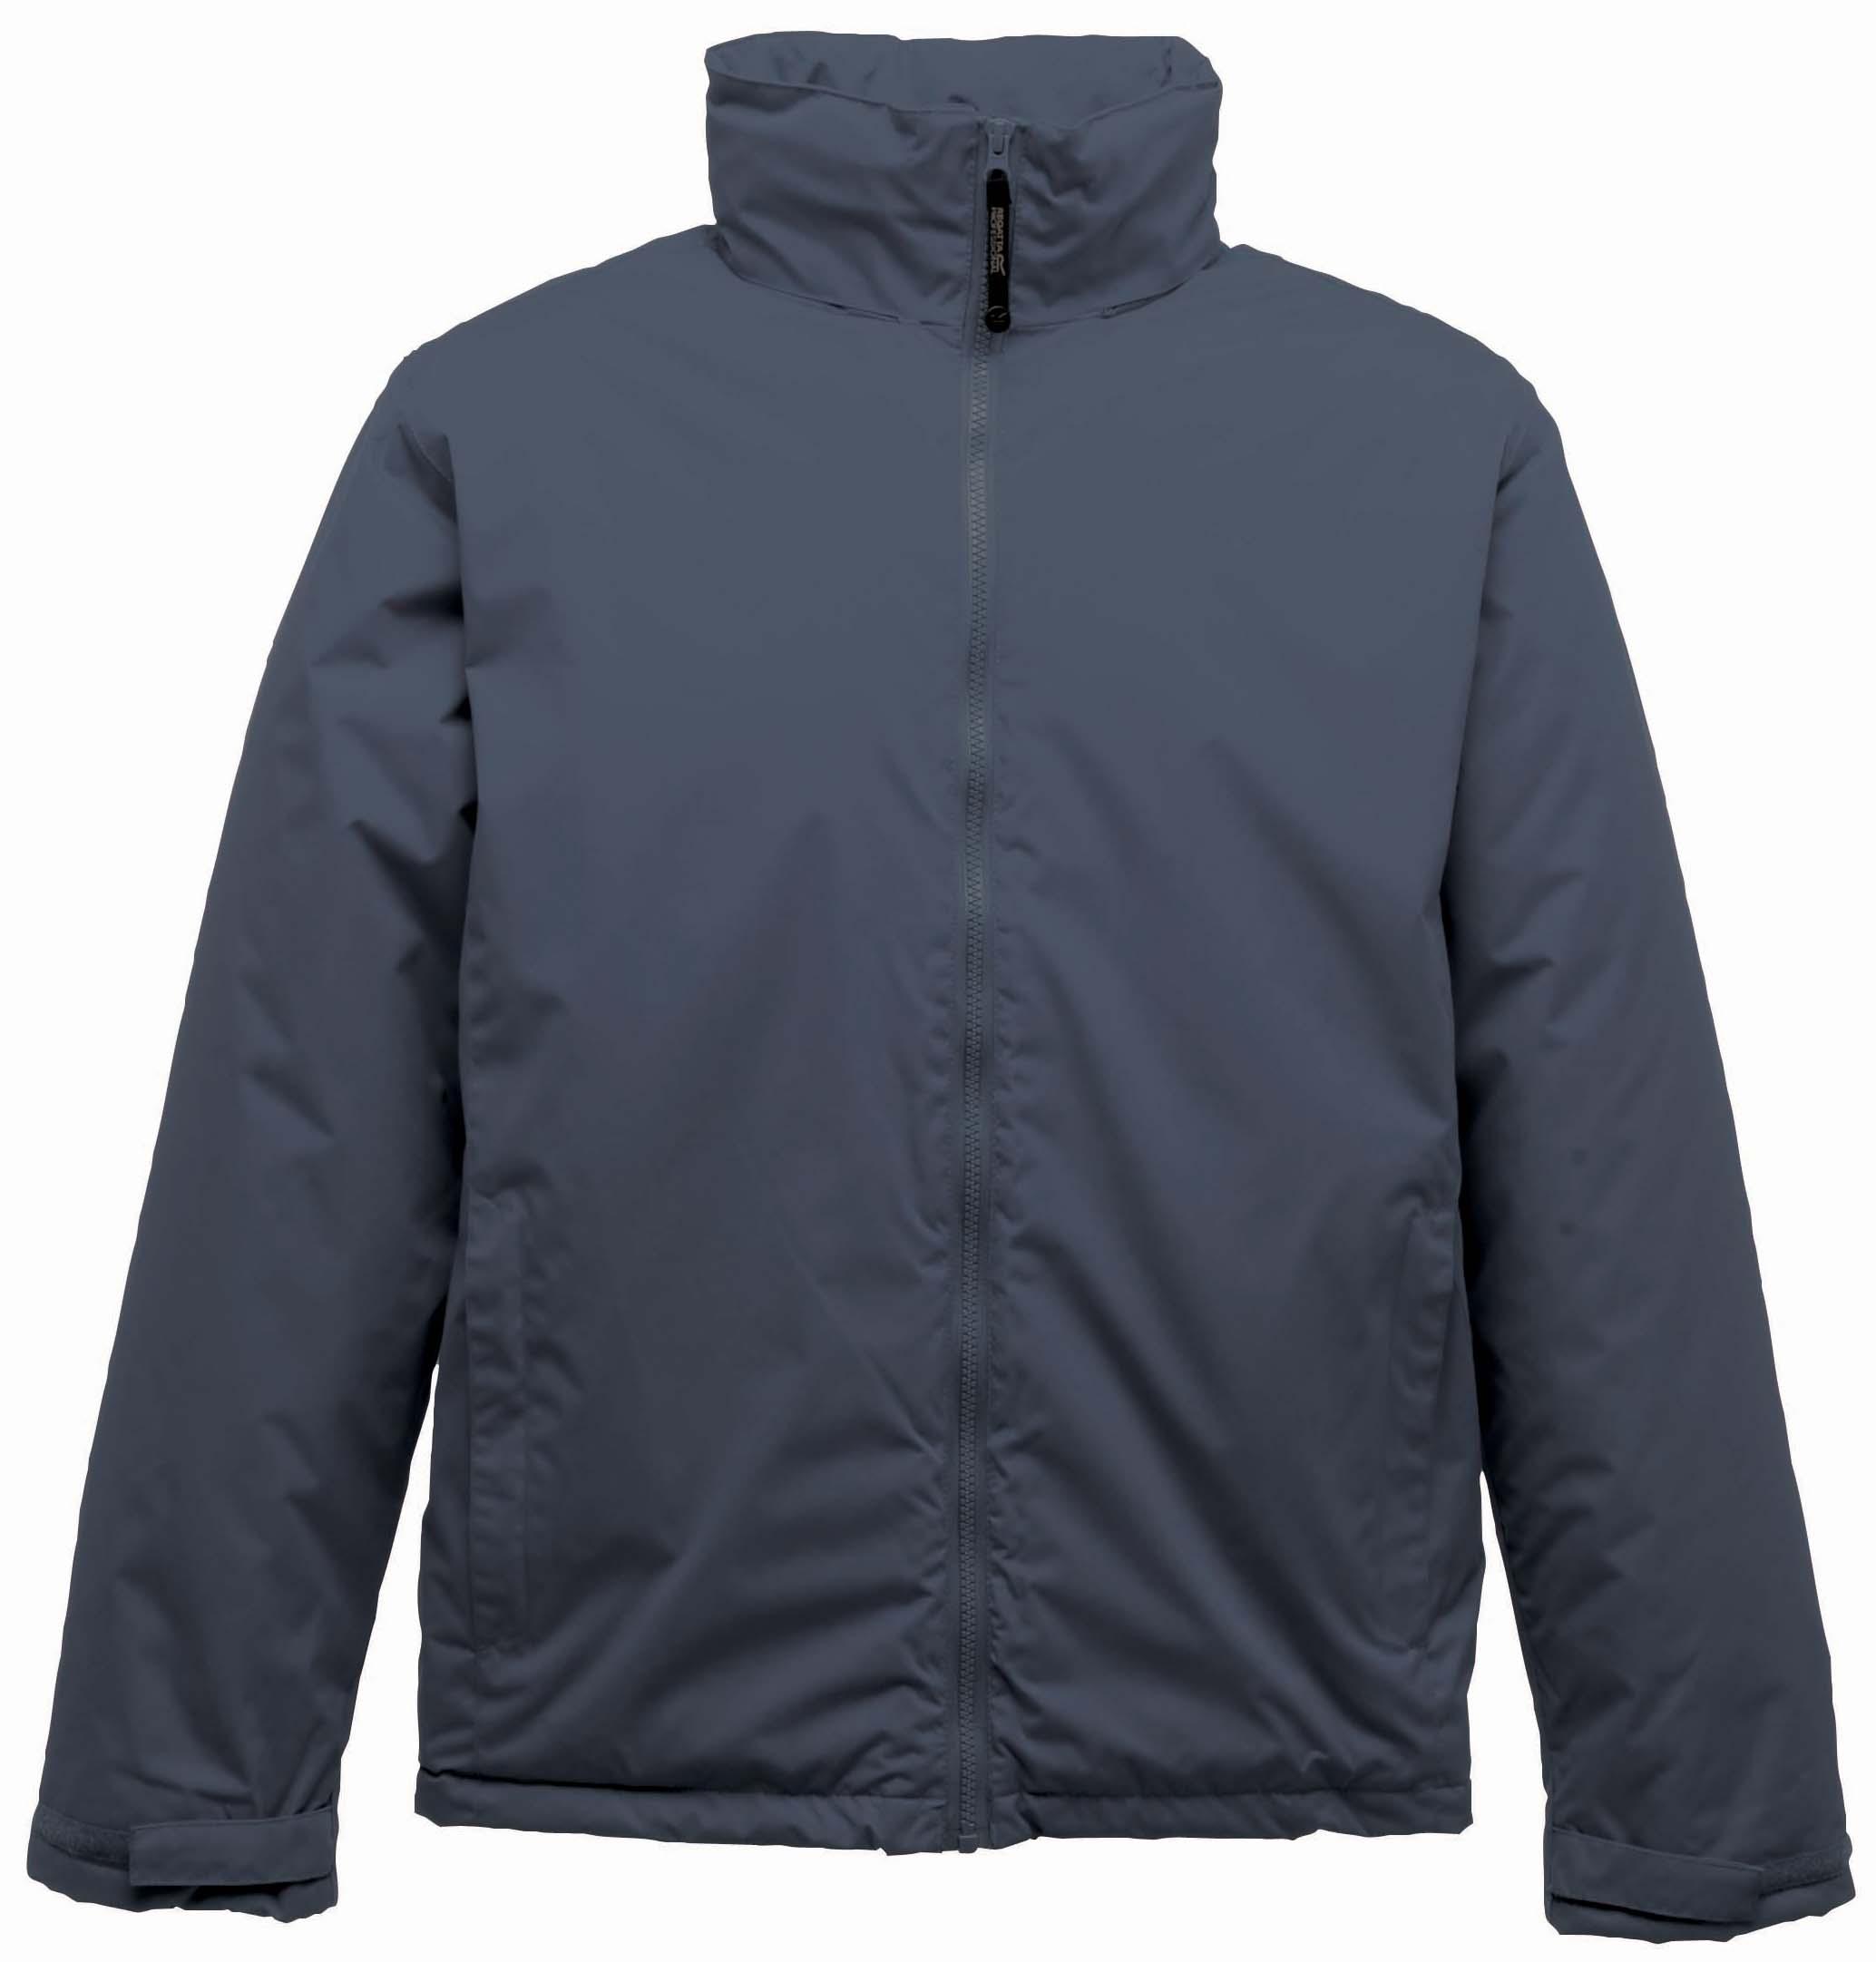 Regatta Classic Shell Jacket Navy (XL)